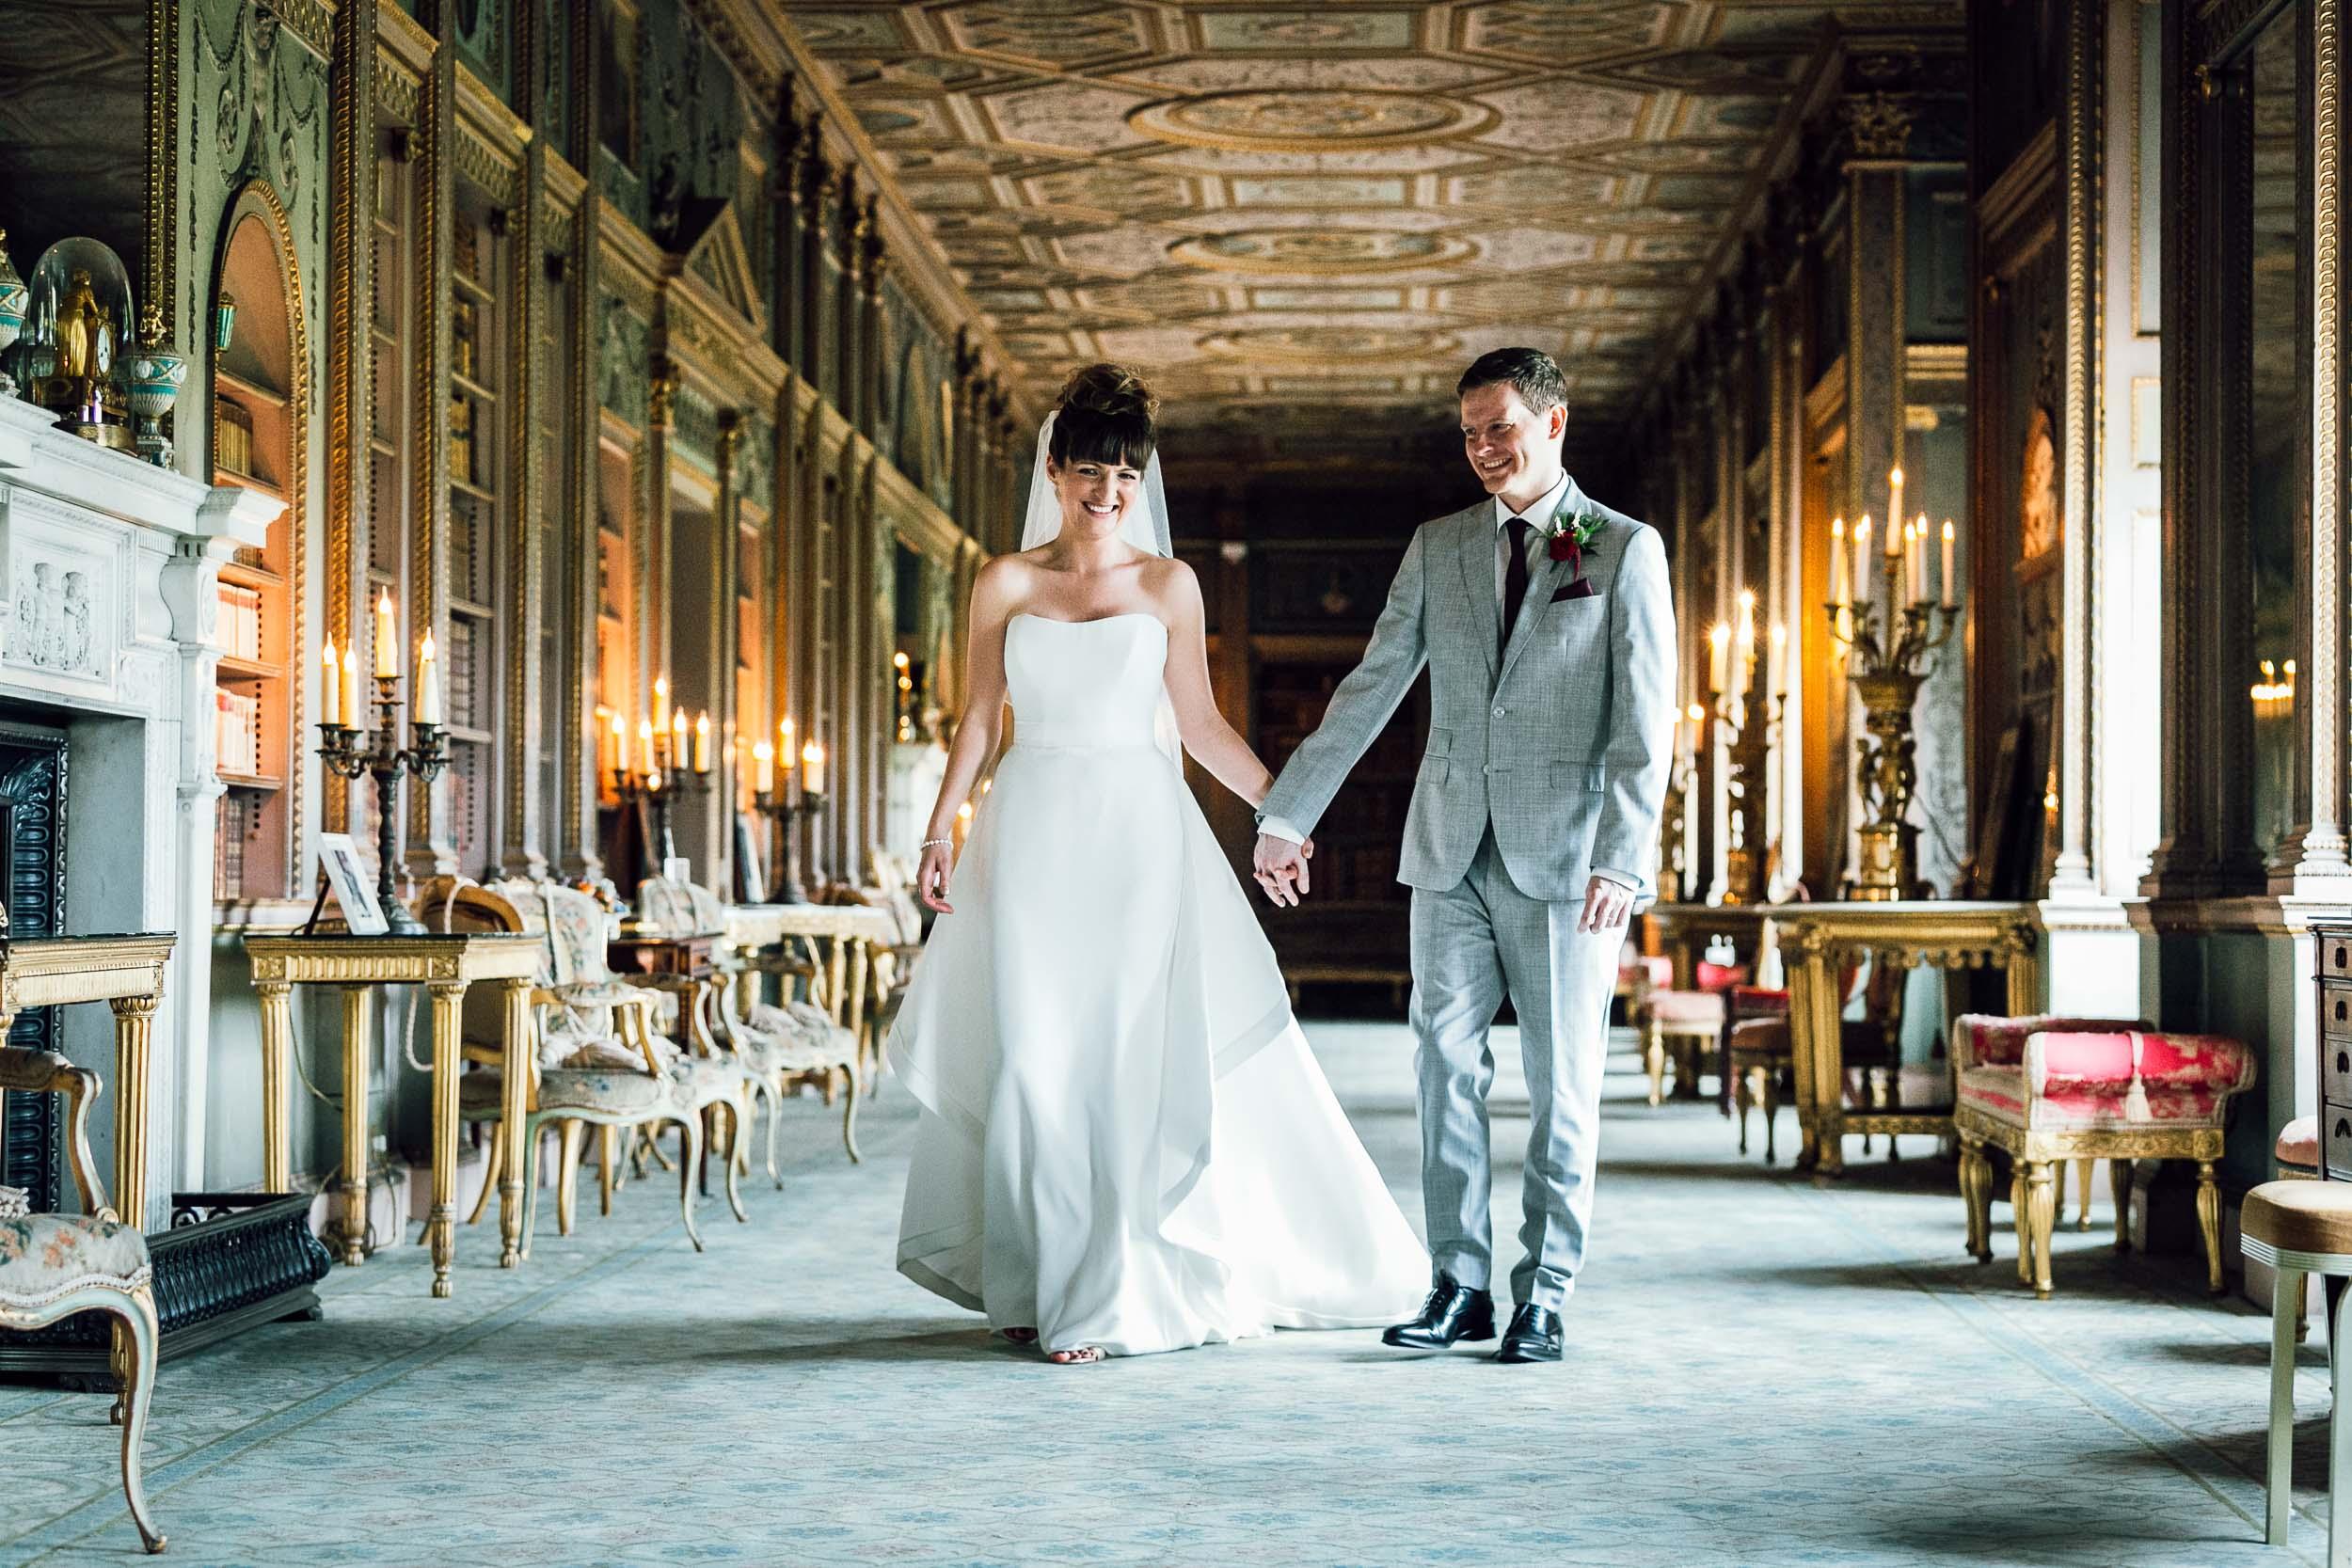 syon-house-wedding-photographer-london 081.jpg